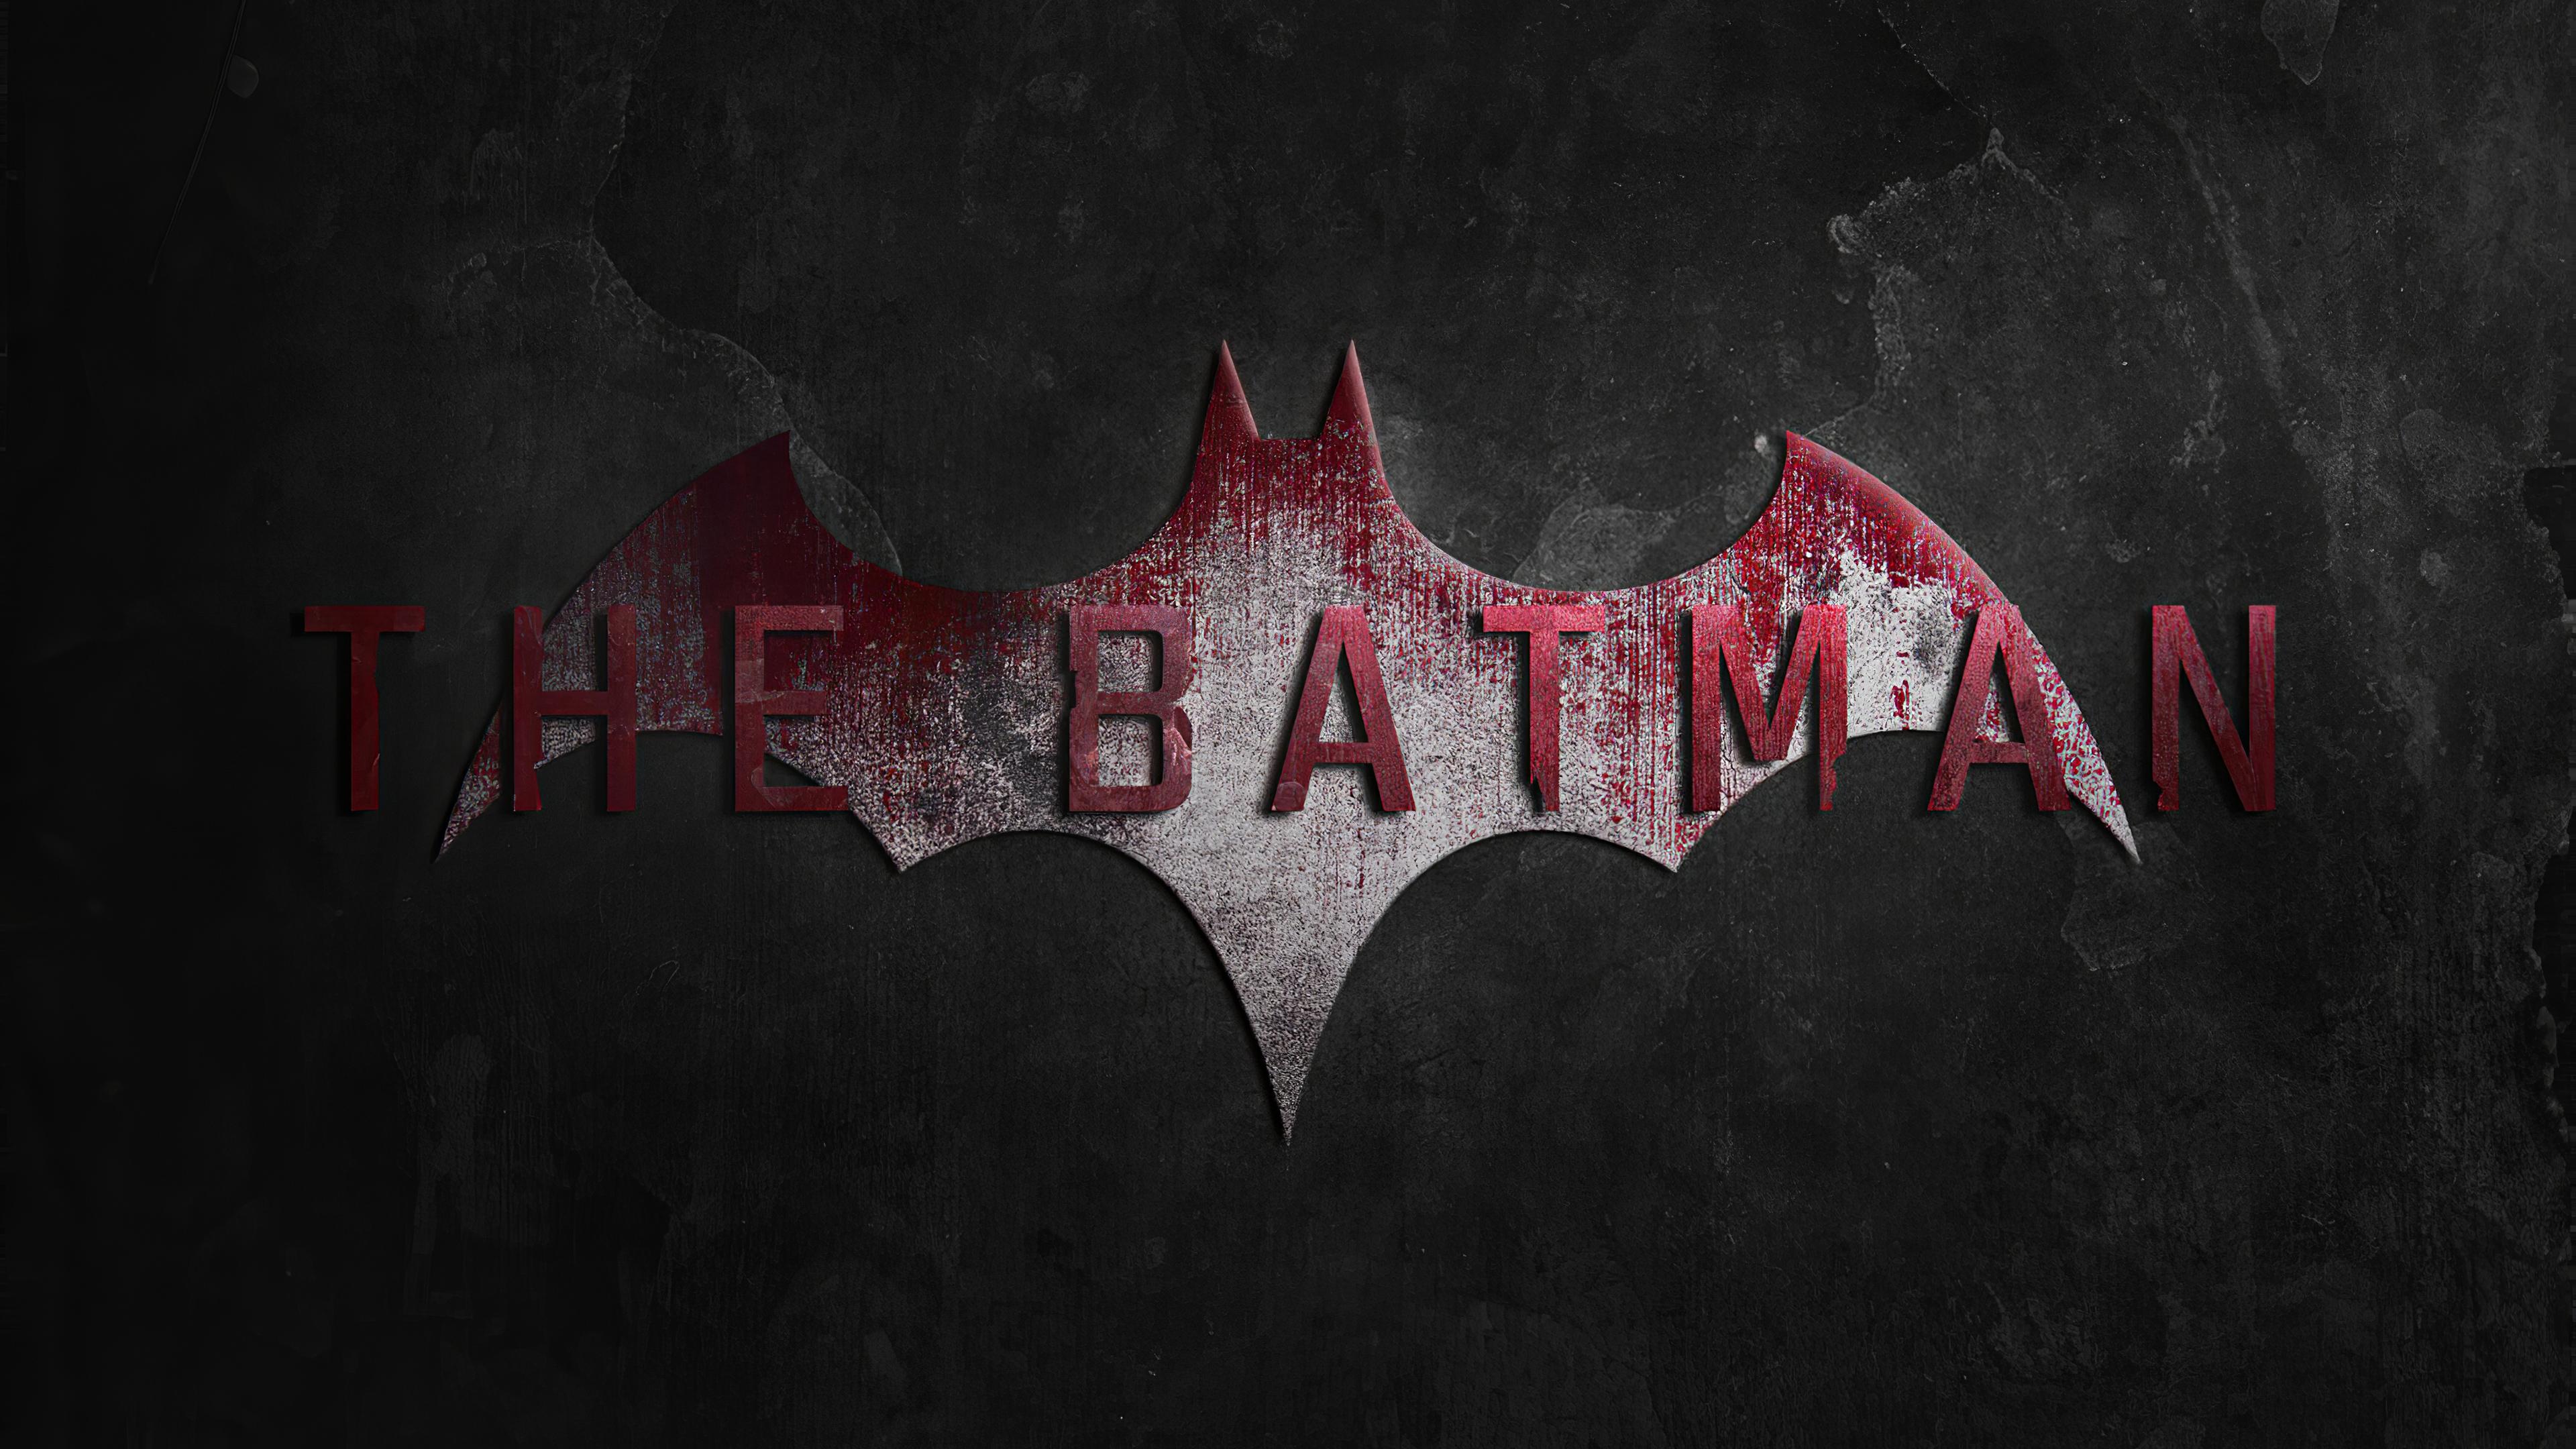 2021 the batman 1581356536 - 2021 The Batman - The Batman 2021 wallpapers, The Batman 2021 movie wallpapers 4k, The Batman 2021 4k wallpapers